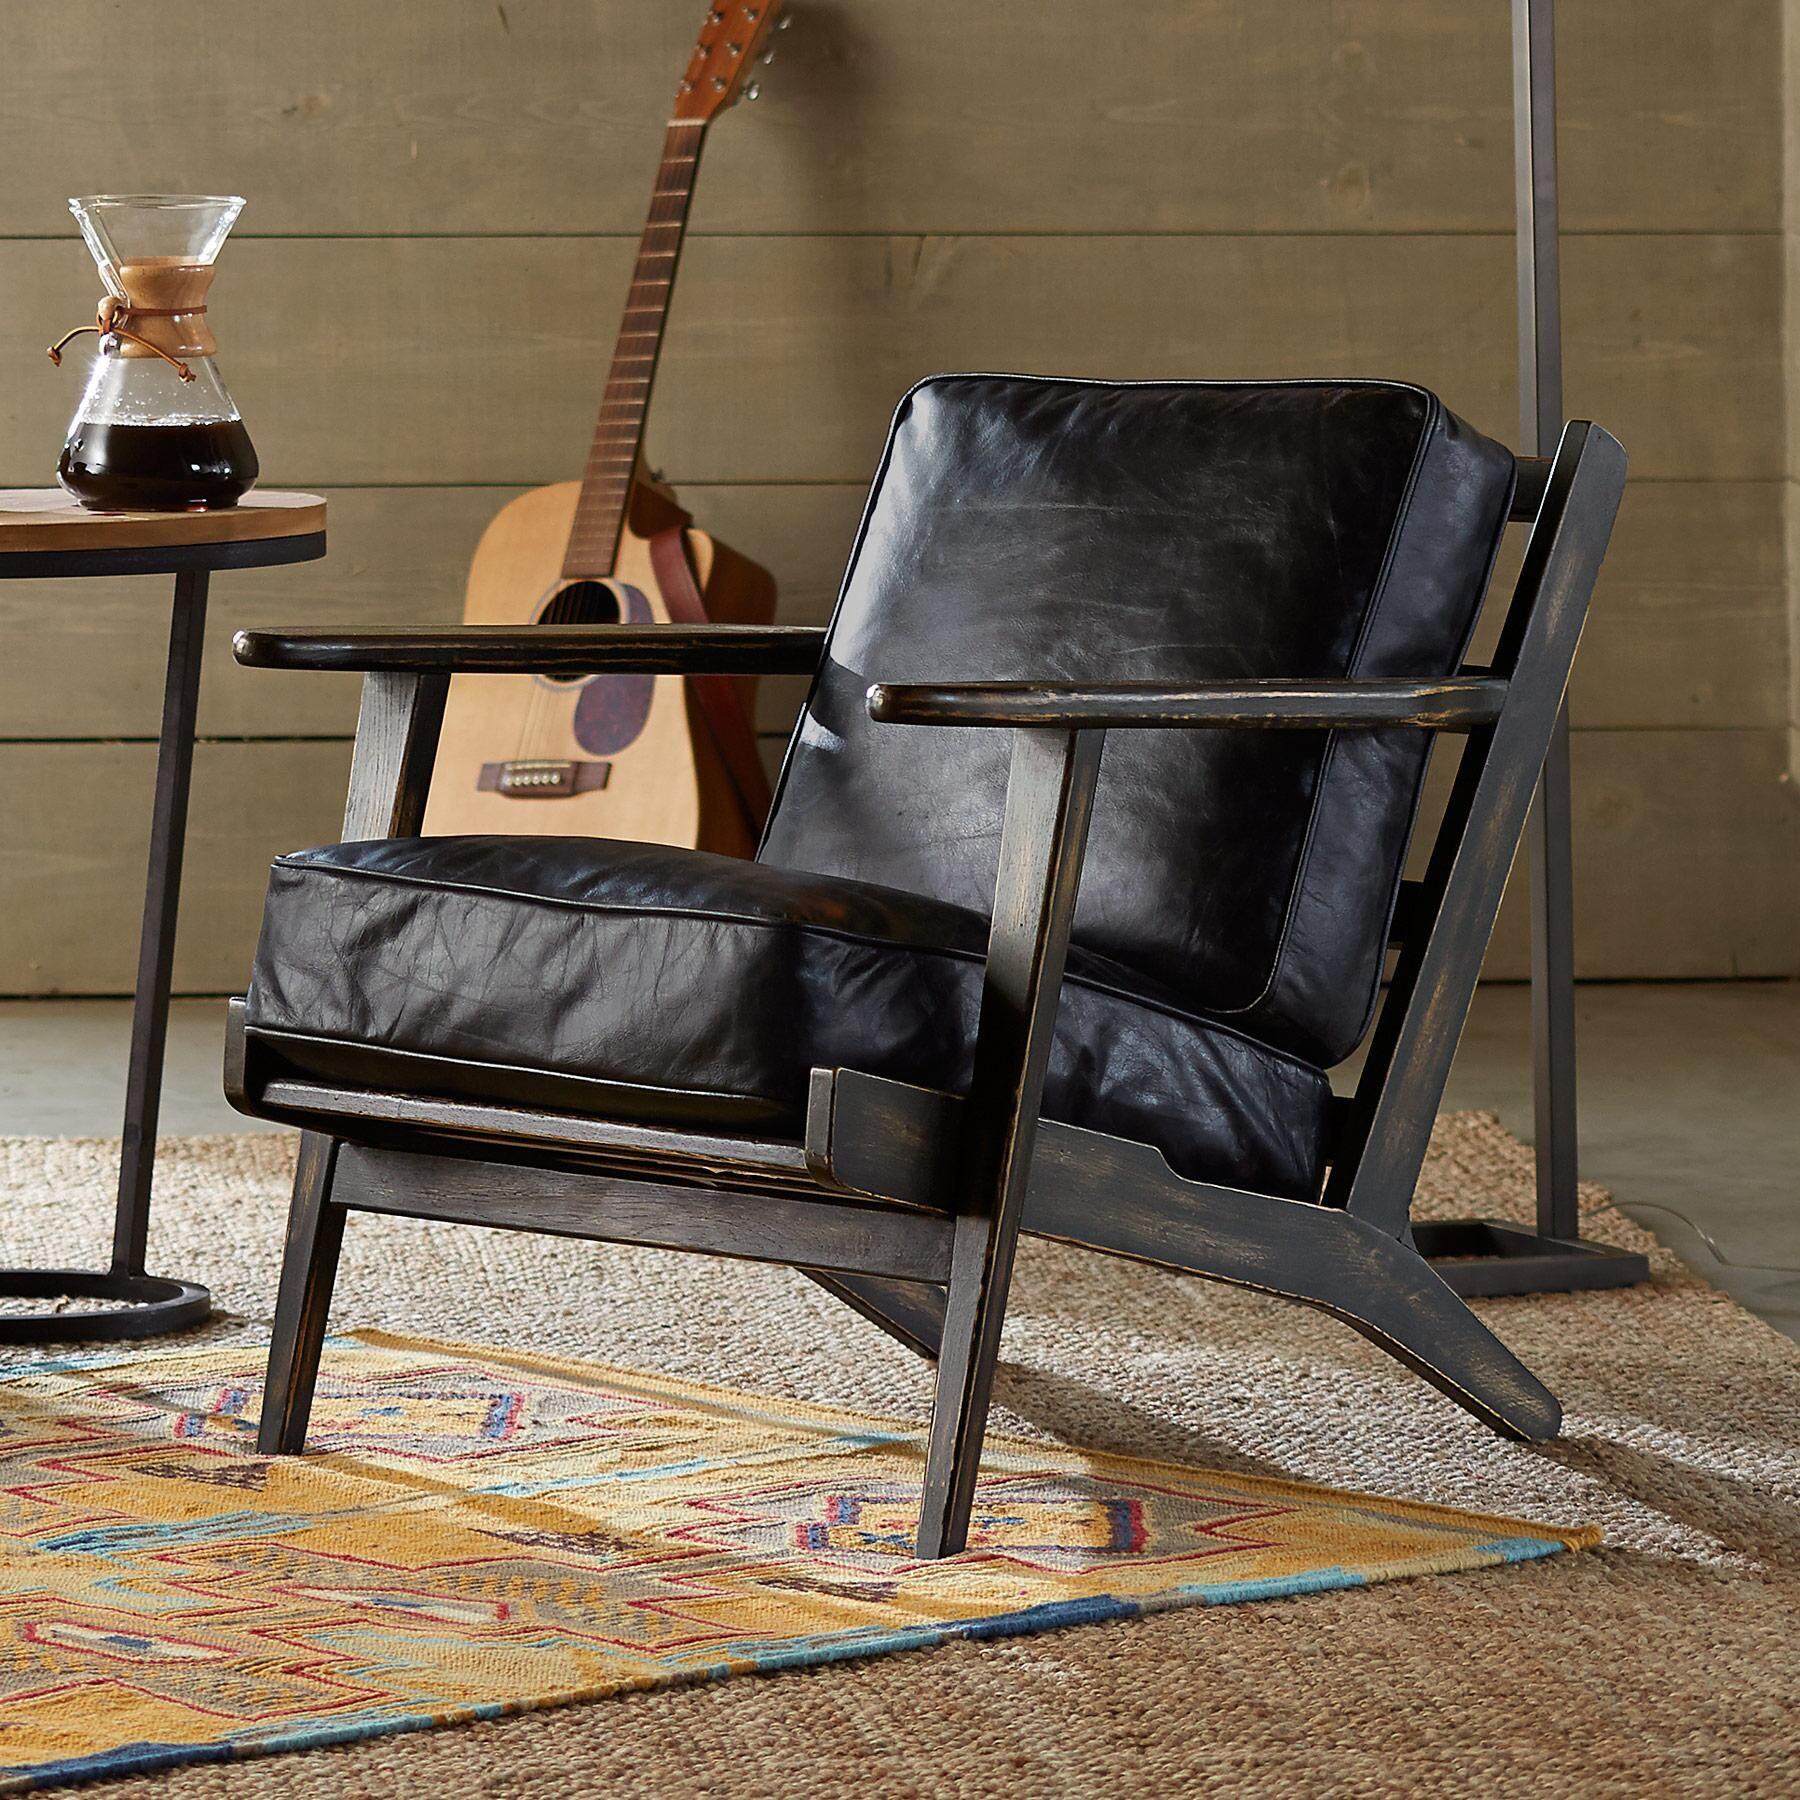 Composite Leather Sofa: Leather Loveseat, Black Leather